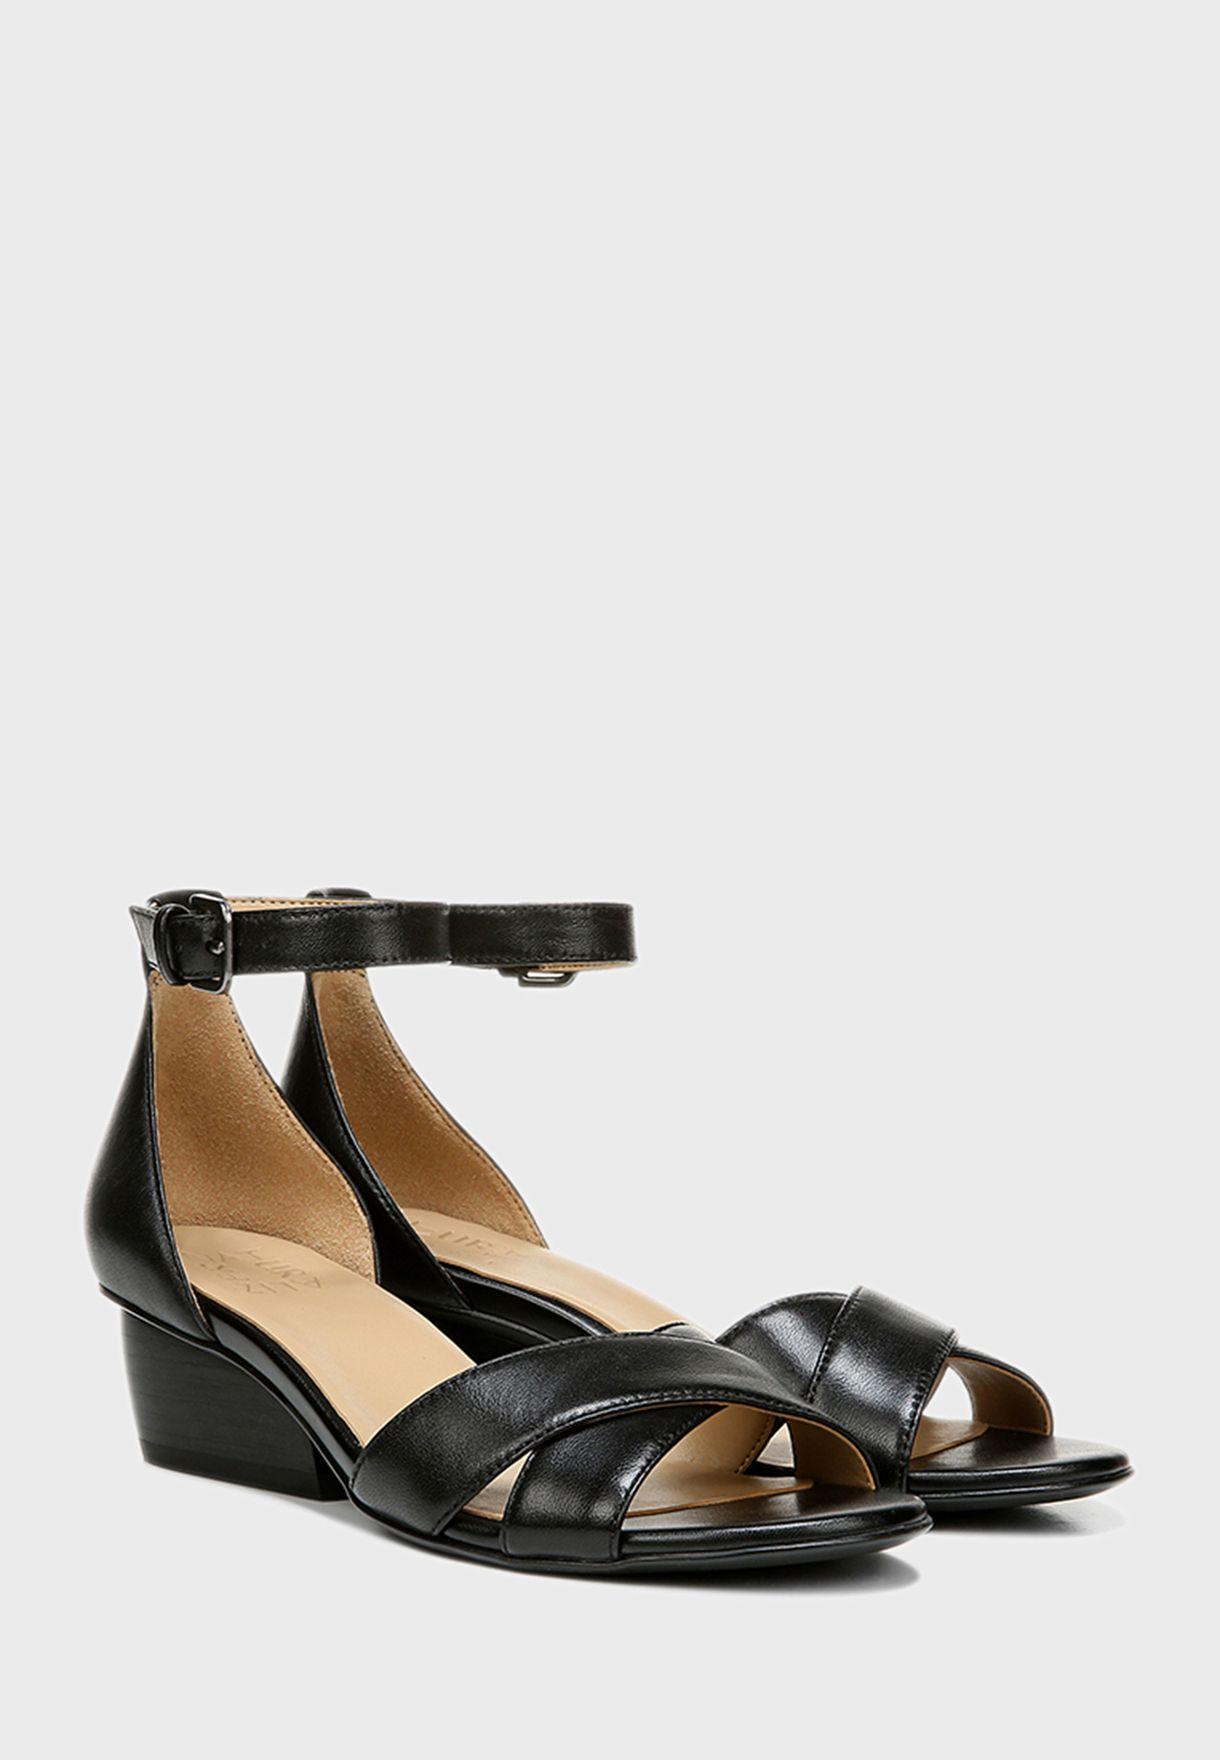 Cross Ankle Strap Low Heel Sandals